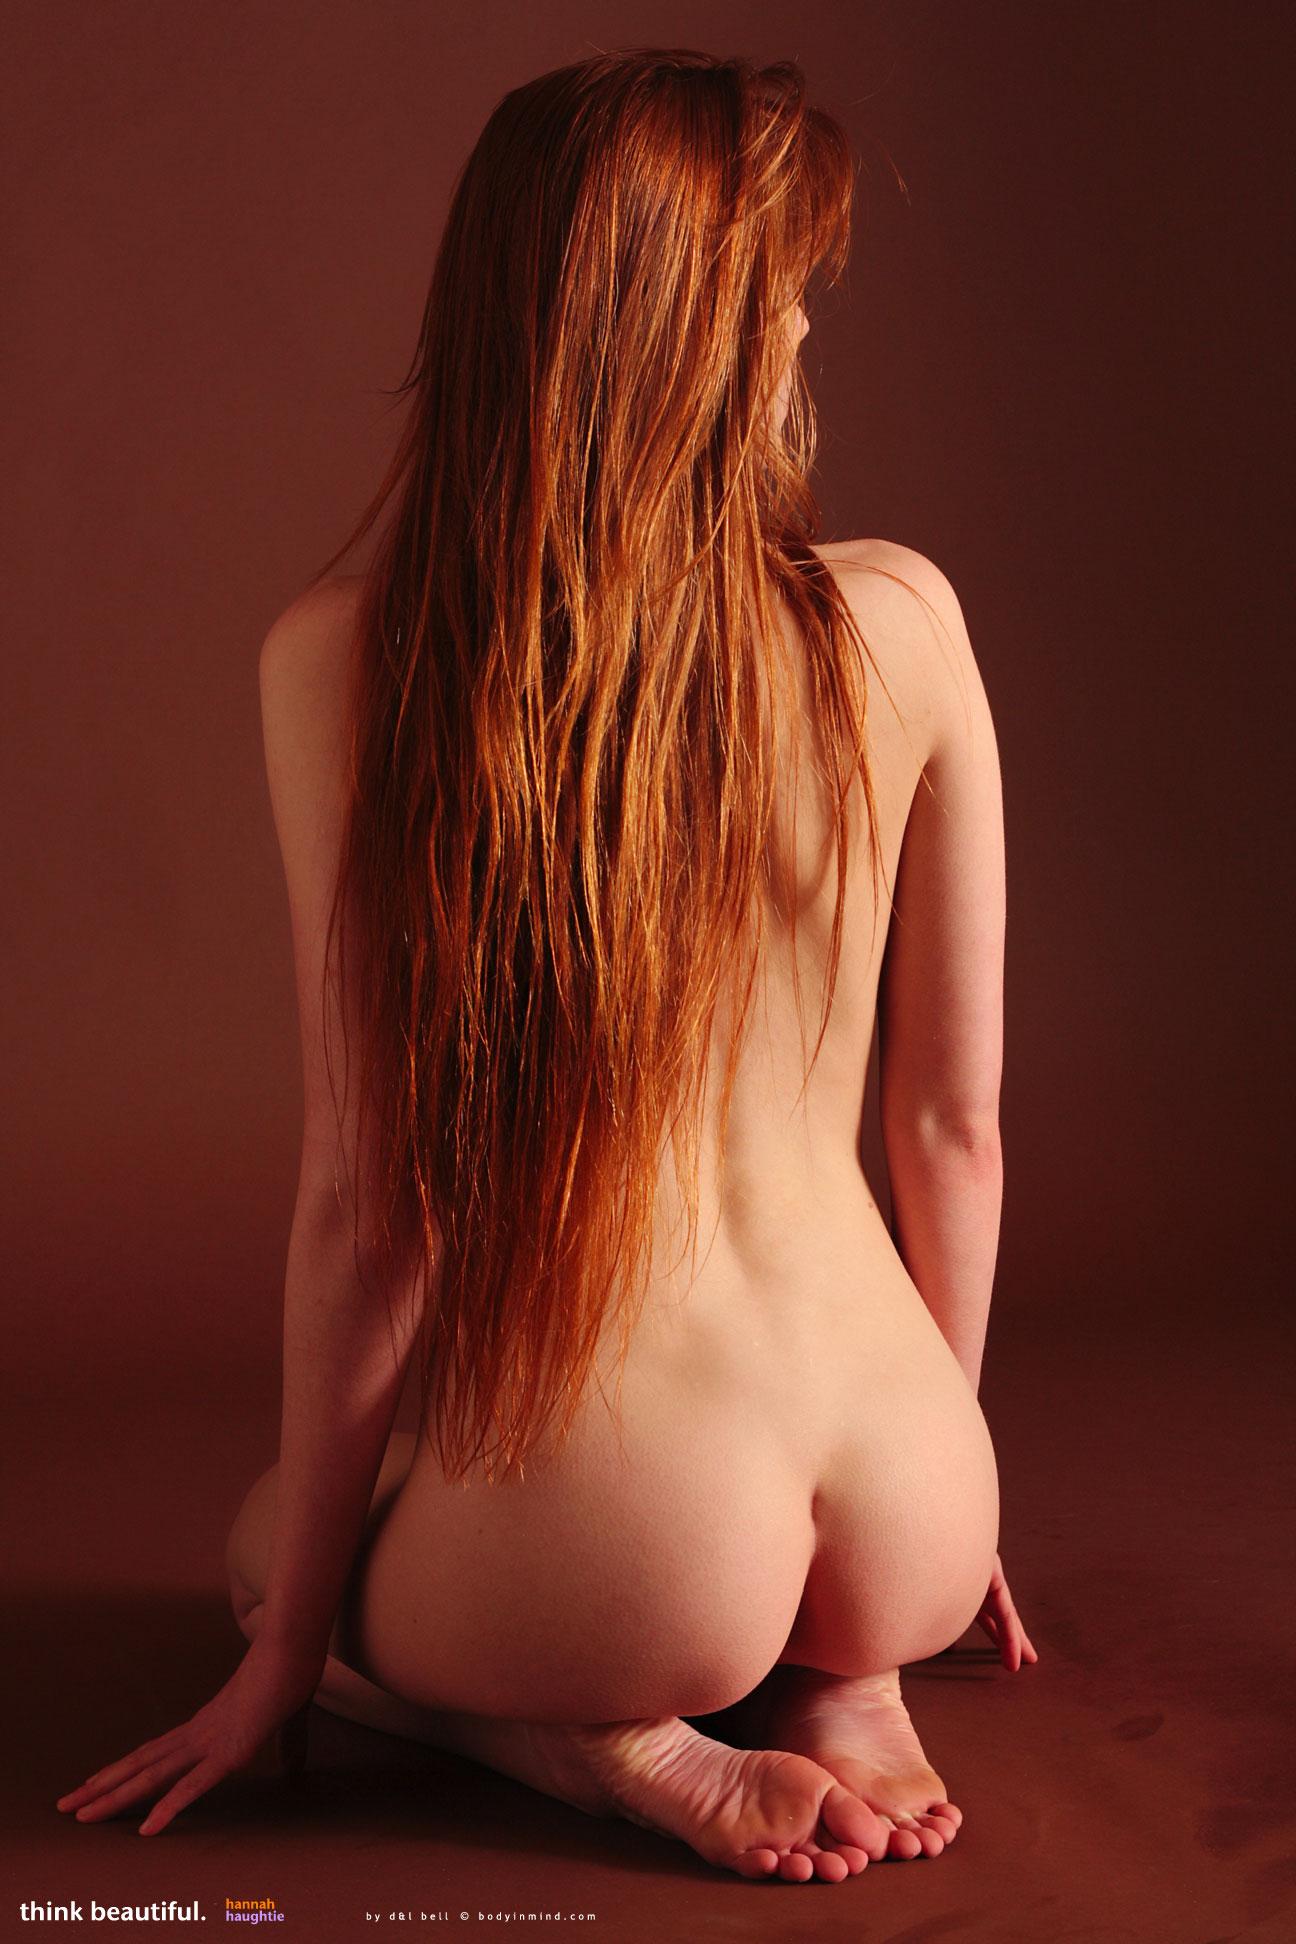 hannah-long-hair-redhead-naked-young-bodyinmind-12